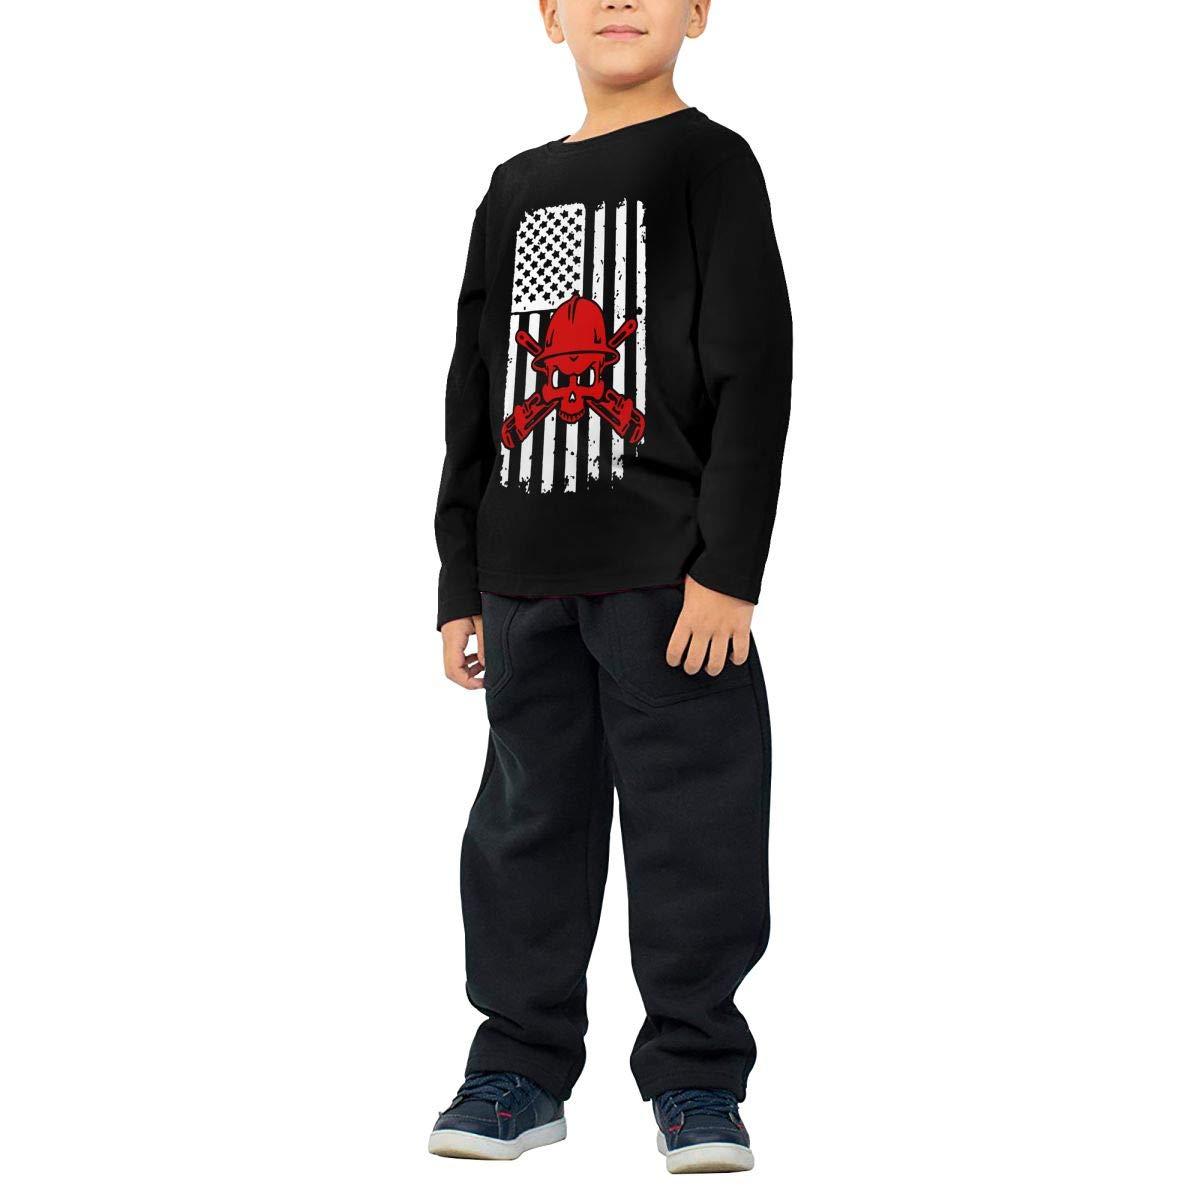 COTDREN Pipefitters American Flag Boys Cotton Long Sleeve Tshirt